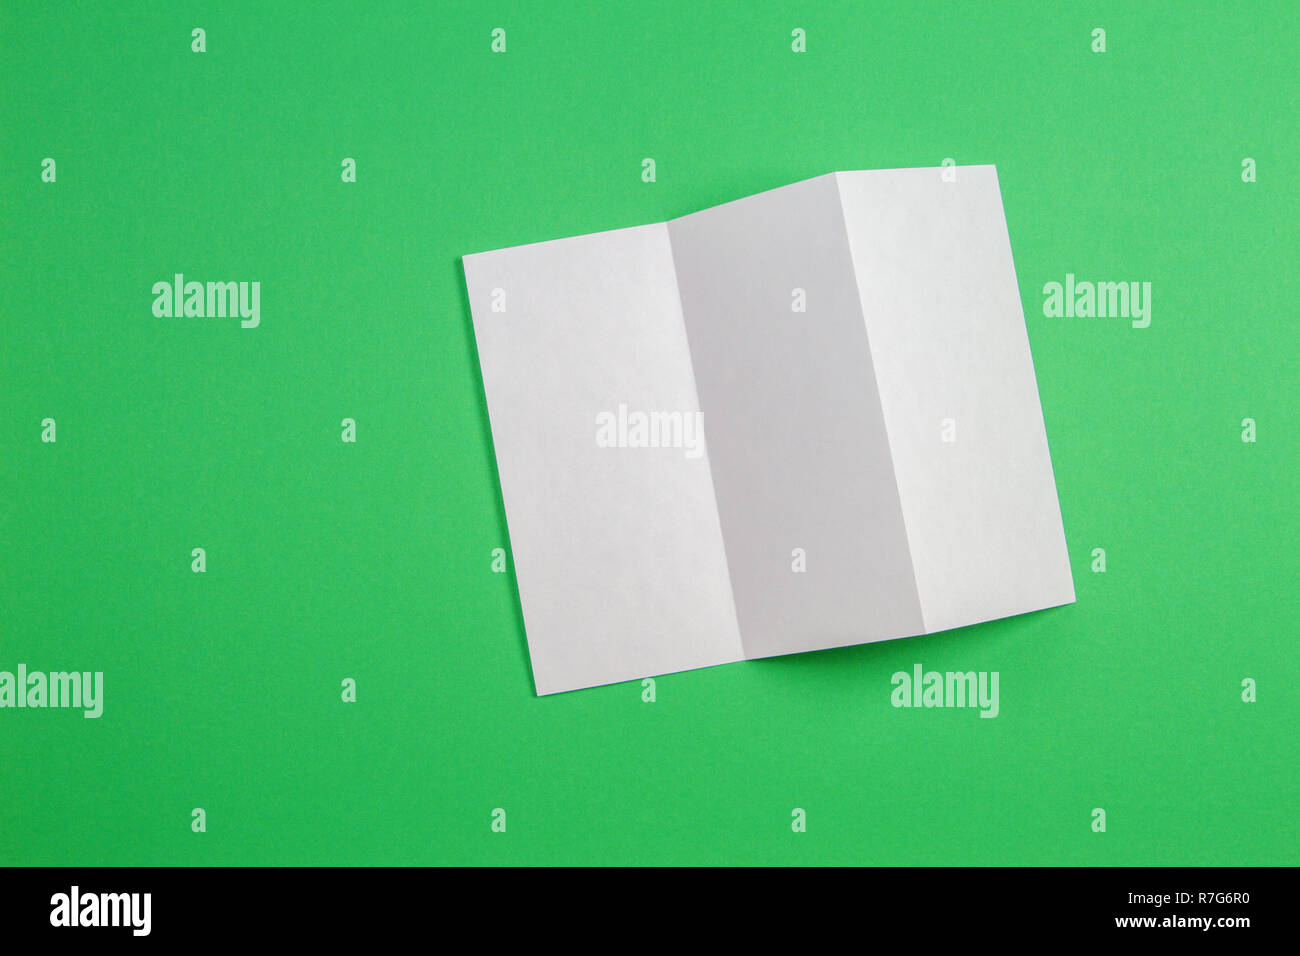 Maquette de blank white tri fold brochure brochure sur fond vert. Photo Stock